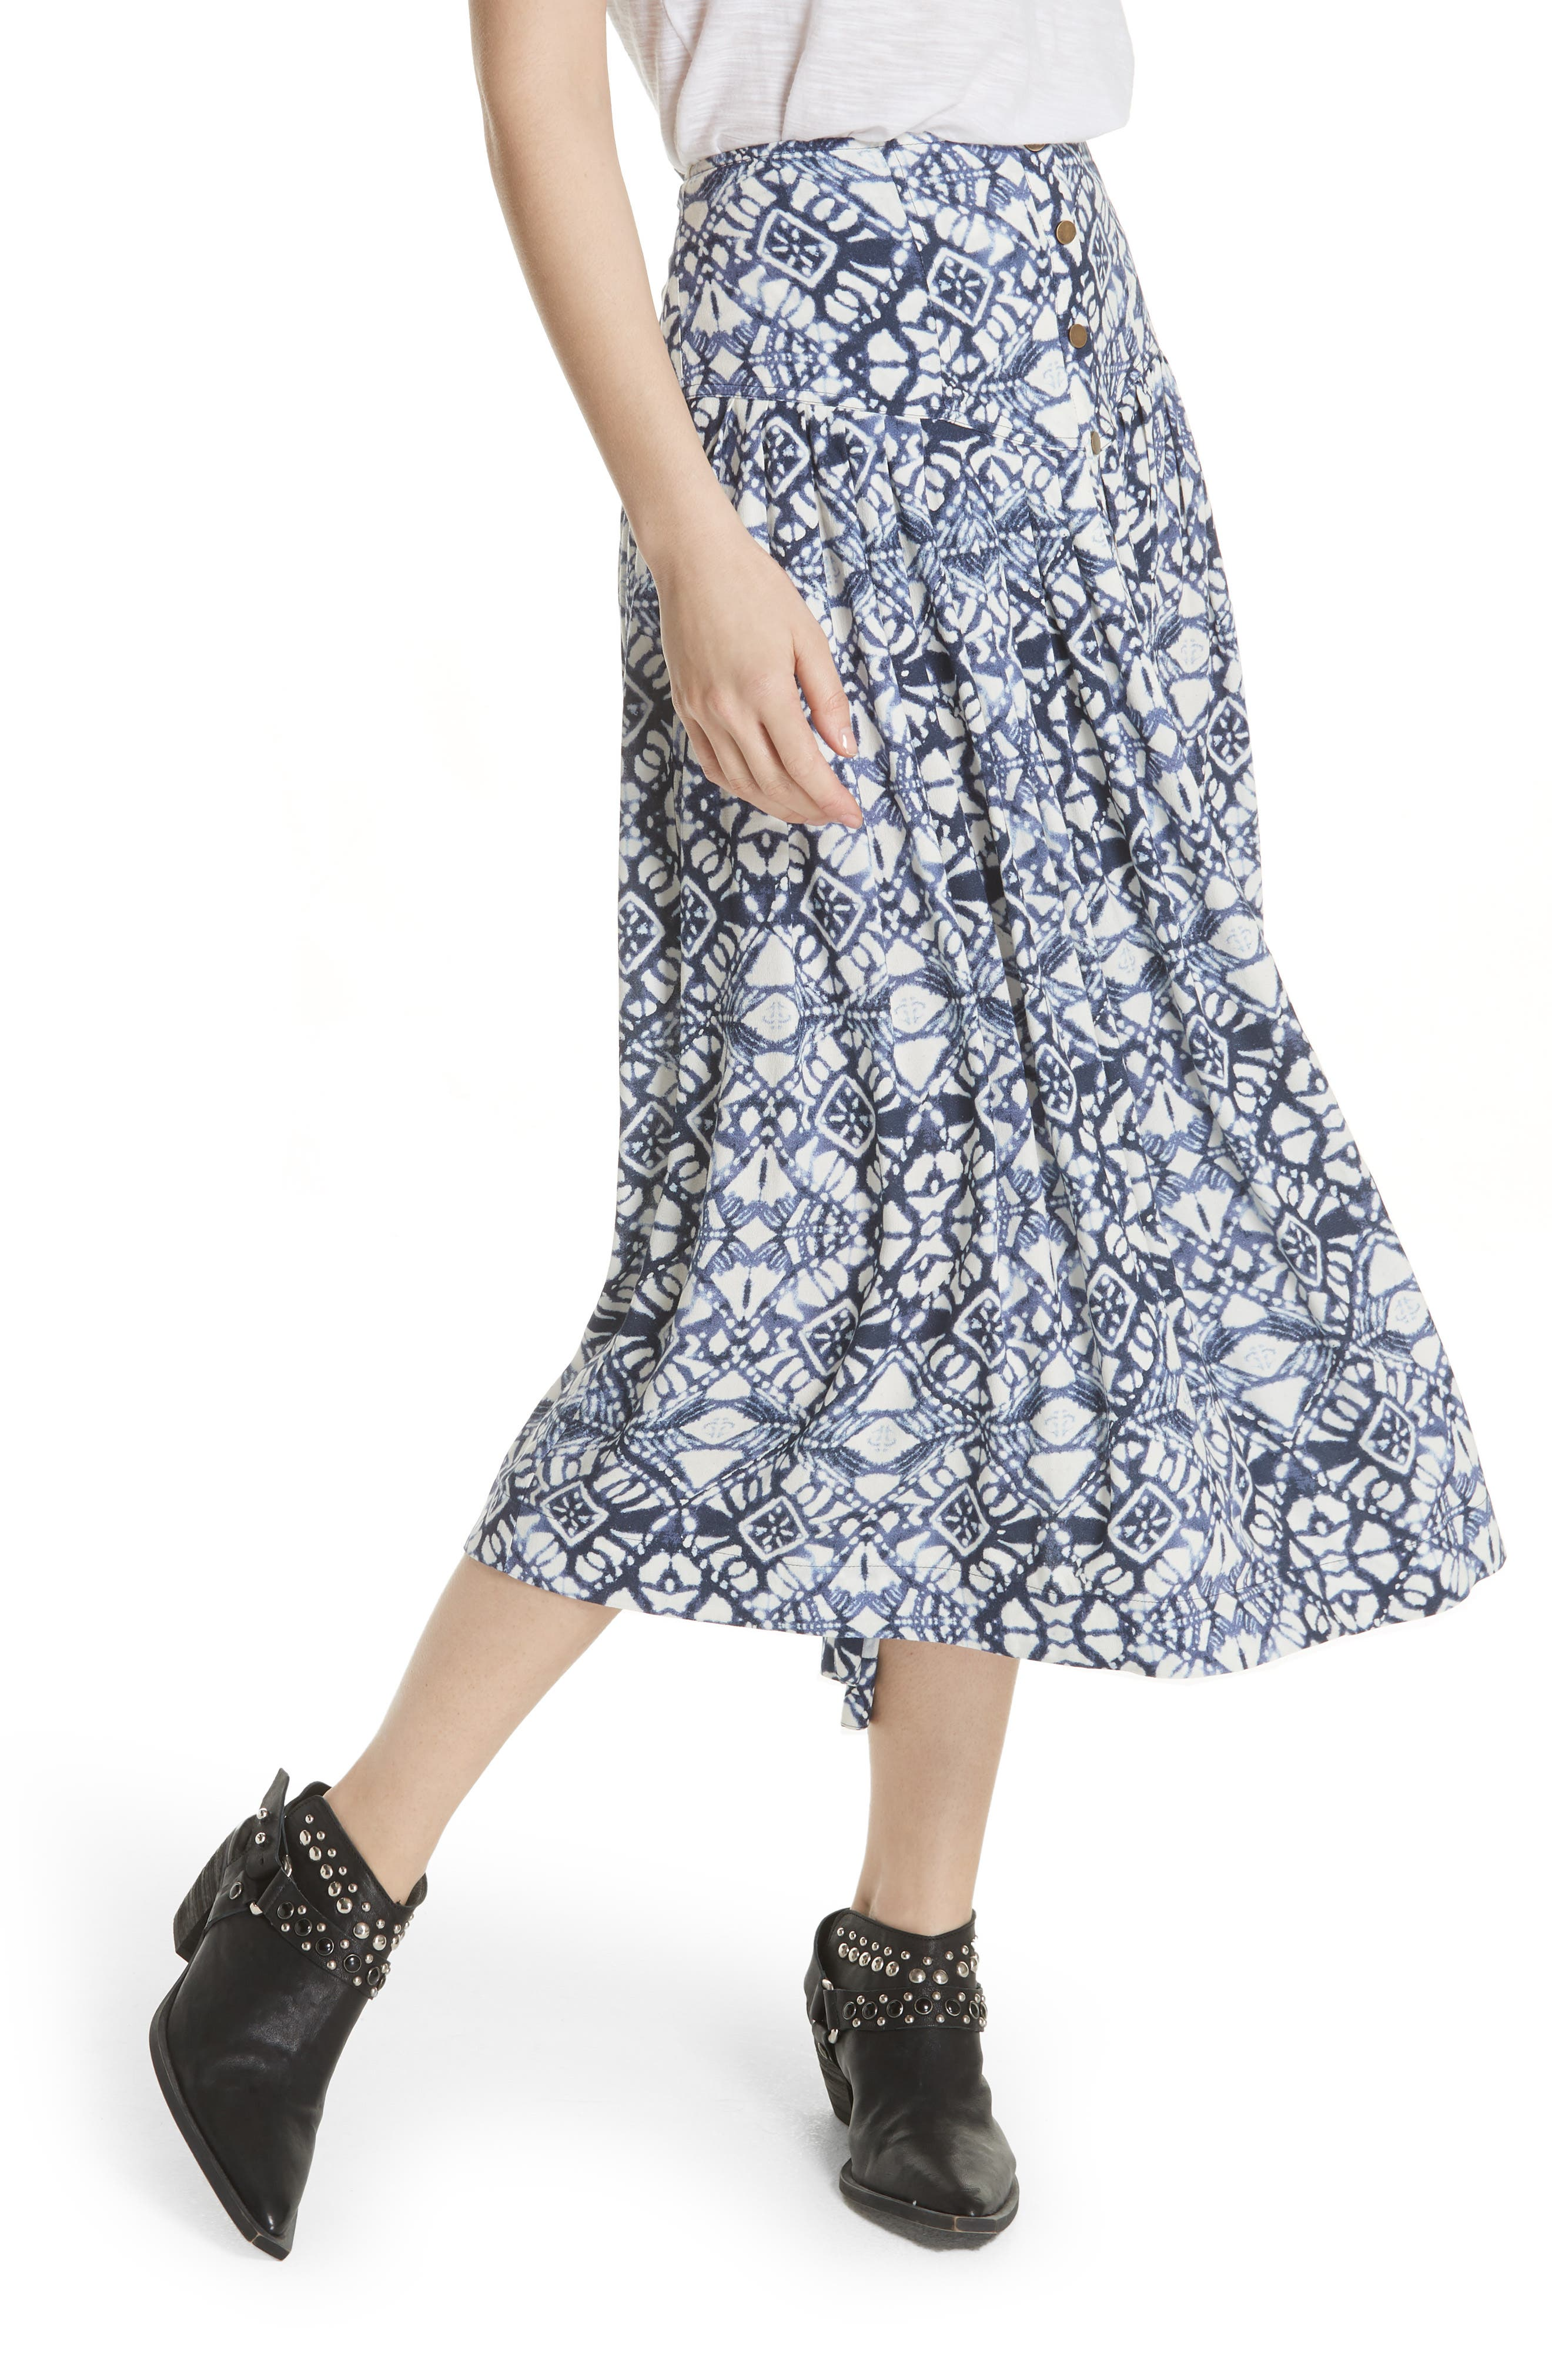 Lovers Dream Midi Skirt,                         Main,                         color, 401